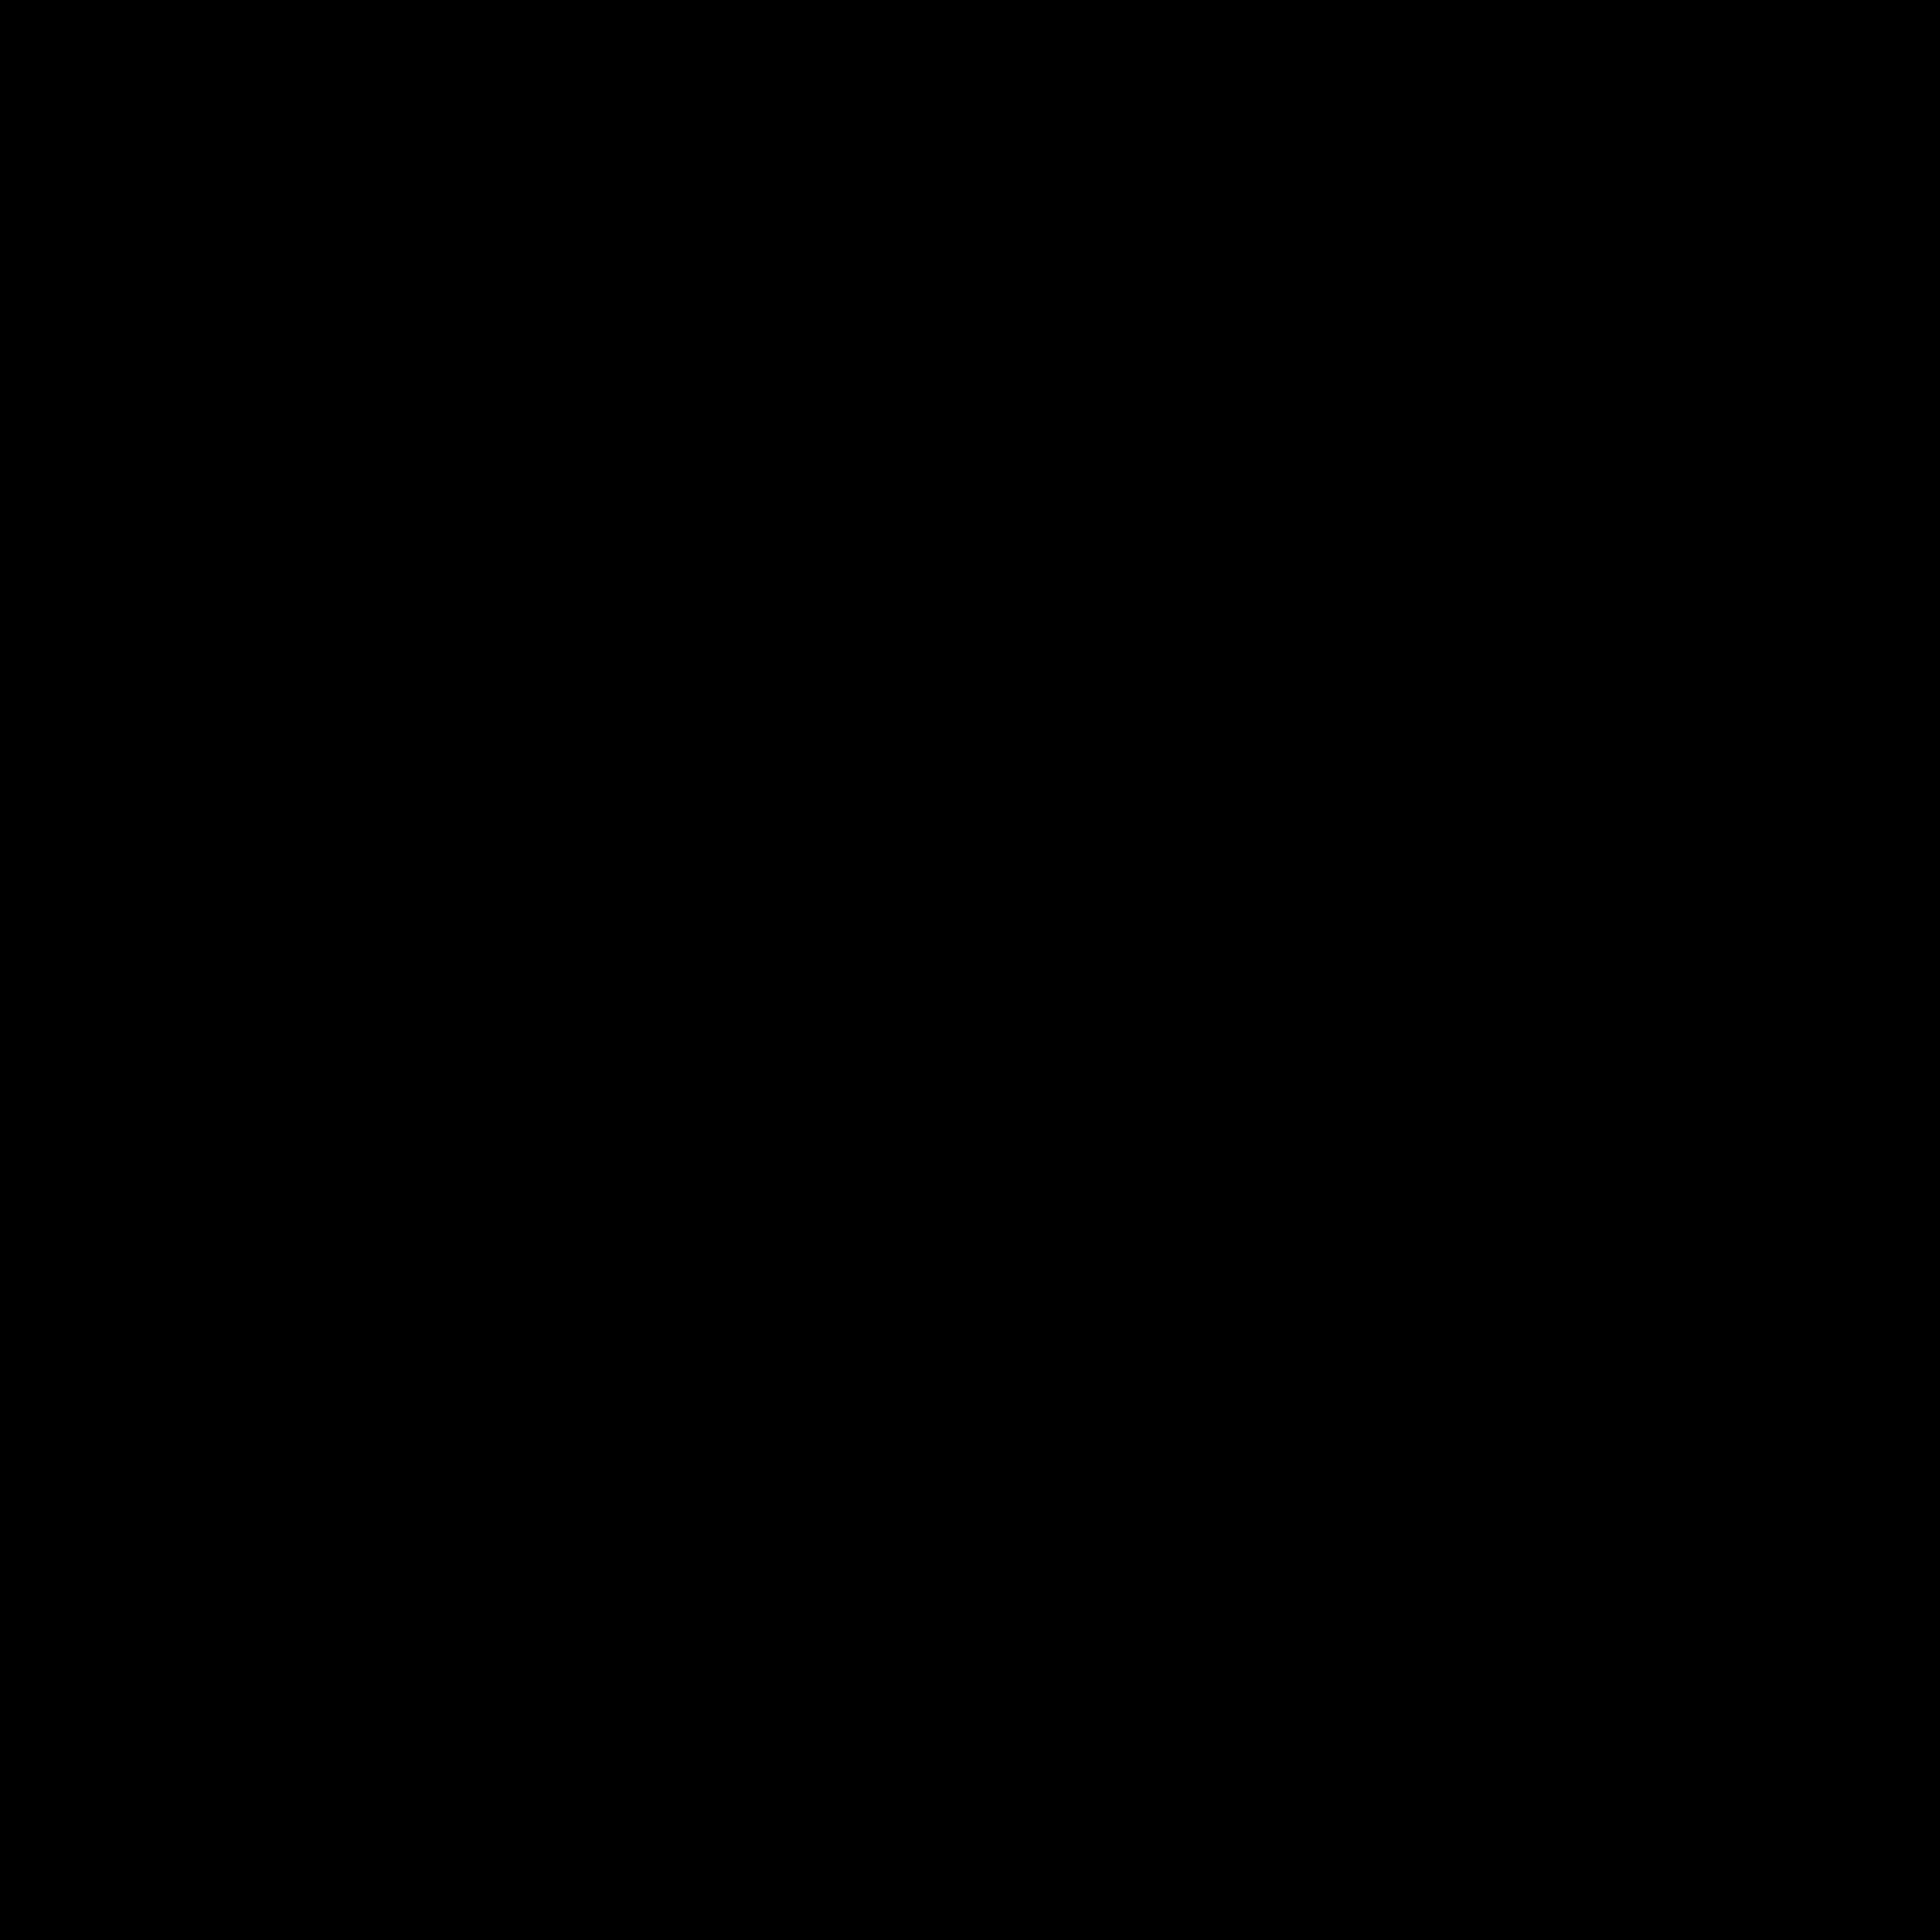 mg_1873